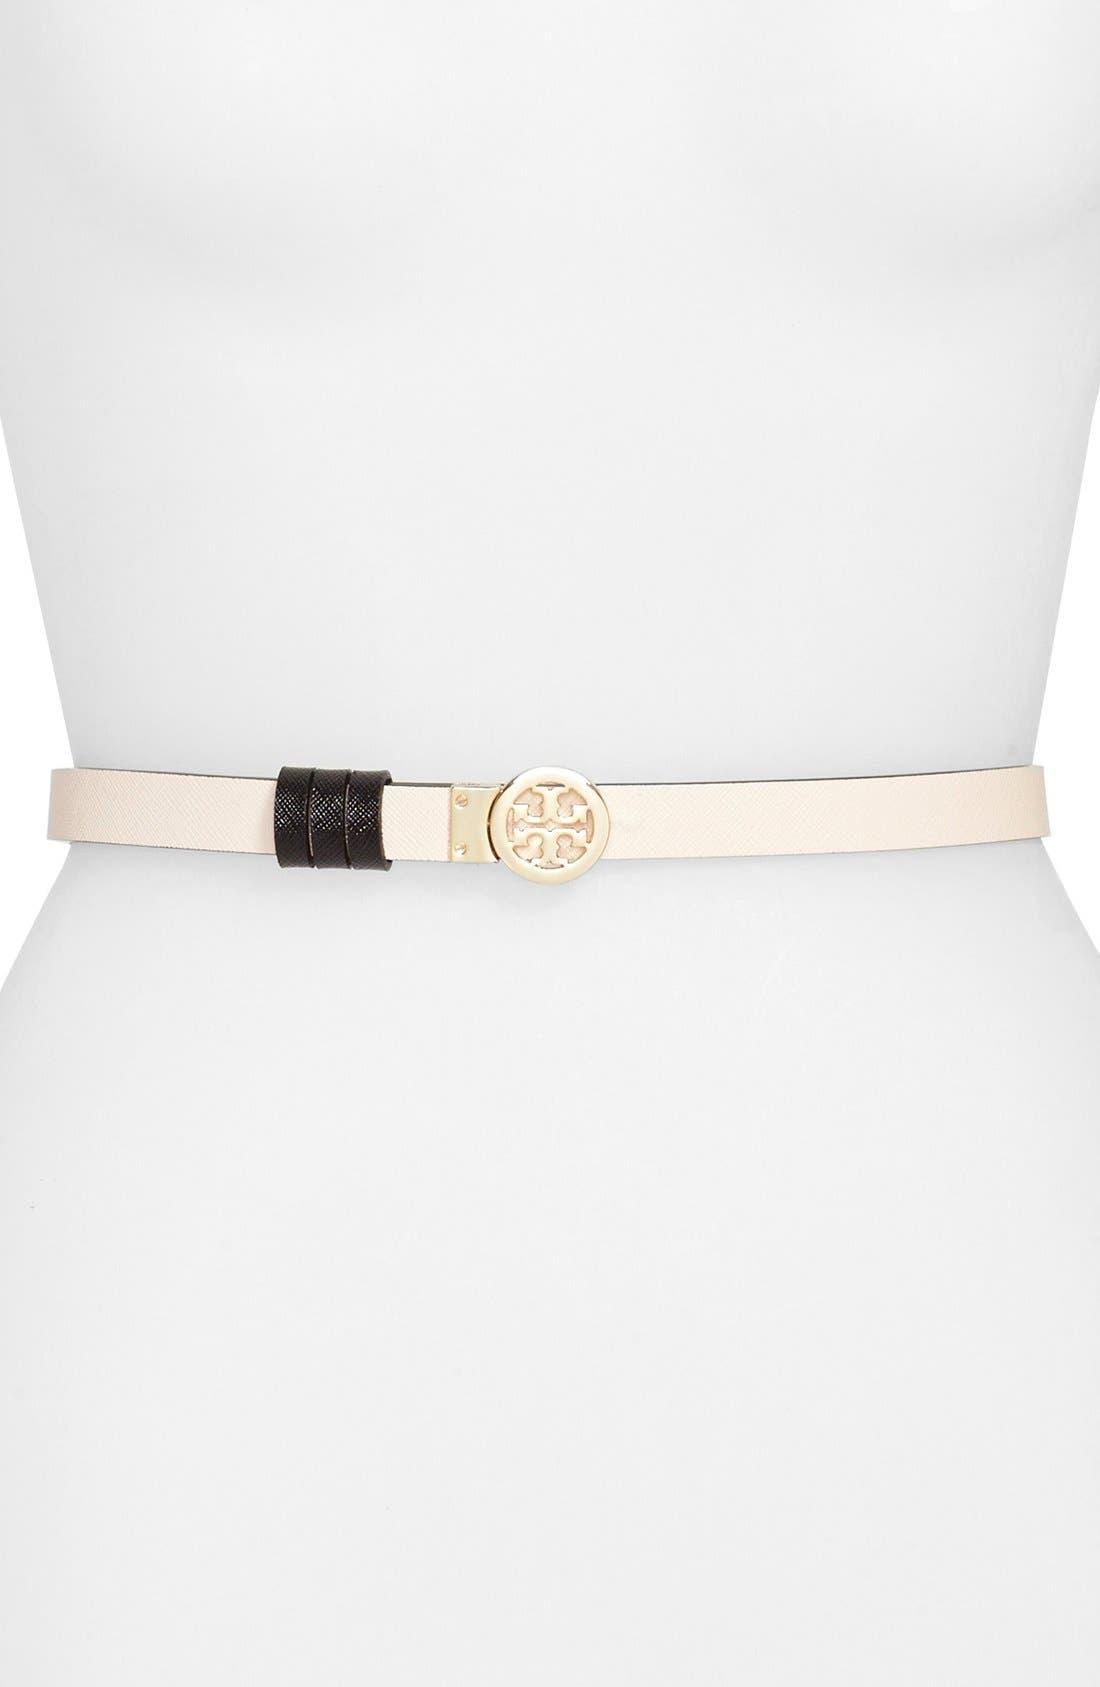 Alternate Image 1 Selected - Tory Burch Rotating Logo Skinny Leather Belt